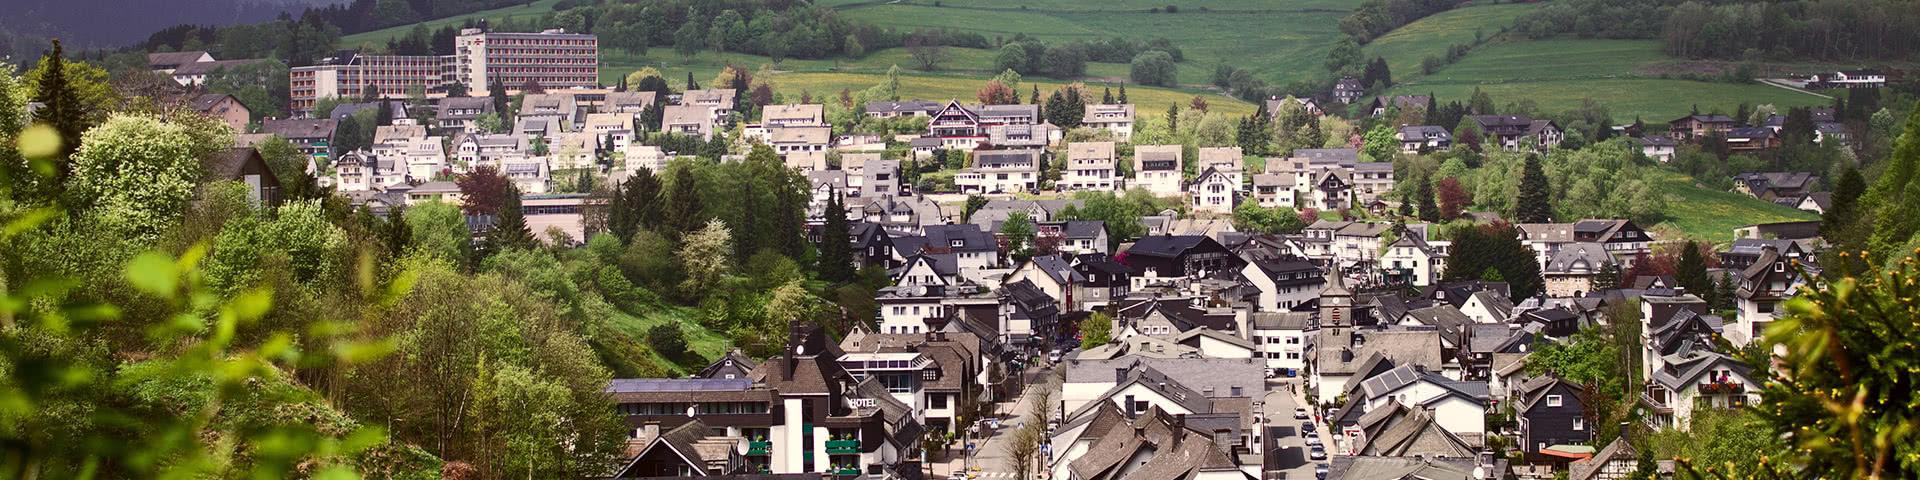 Luftbild Stadt Willingen